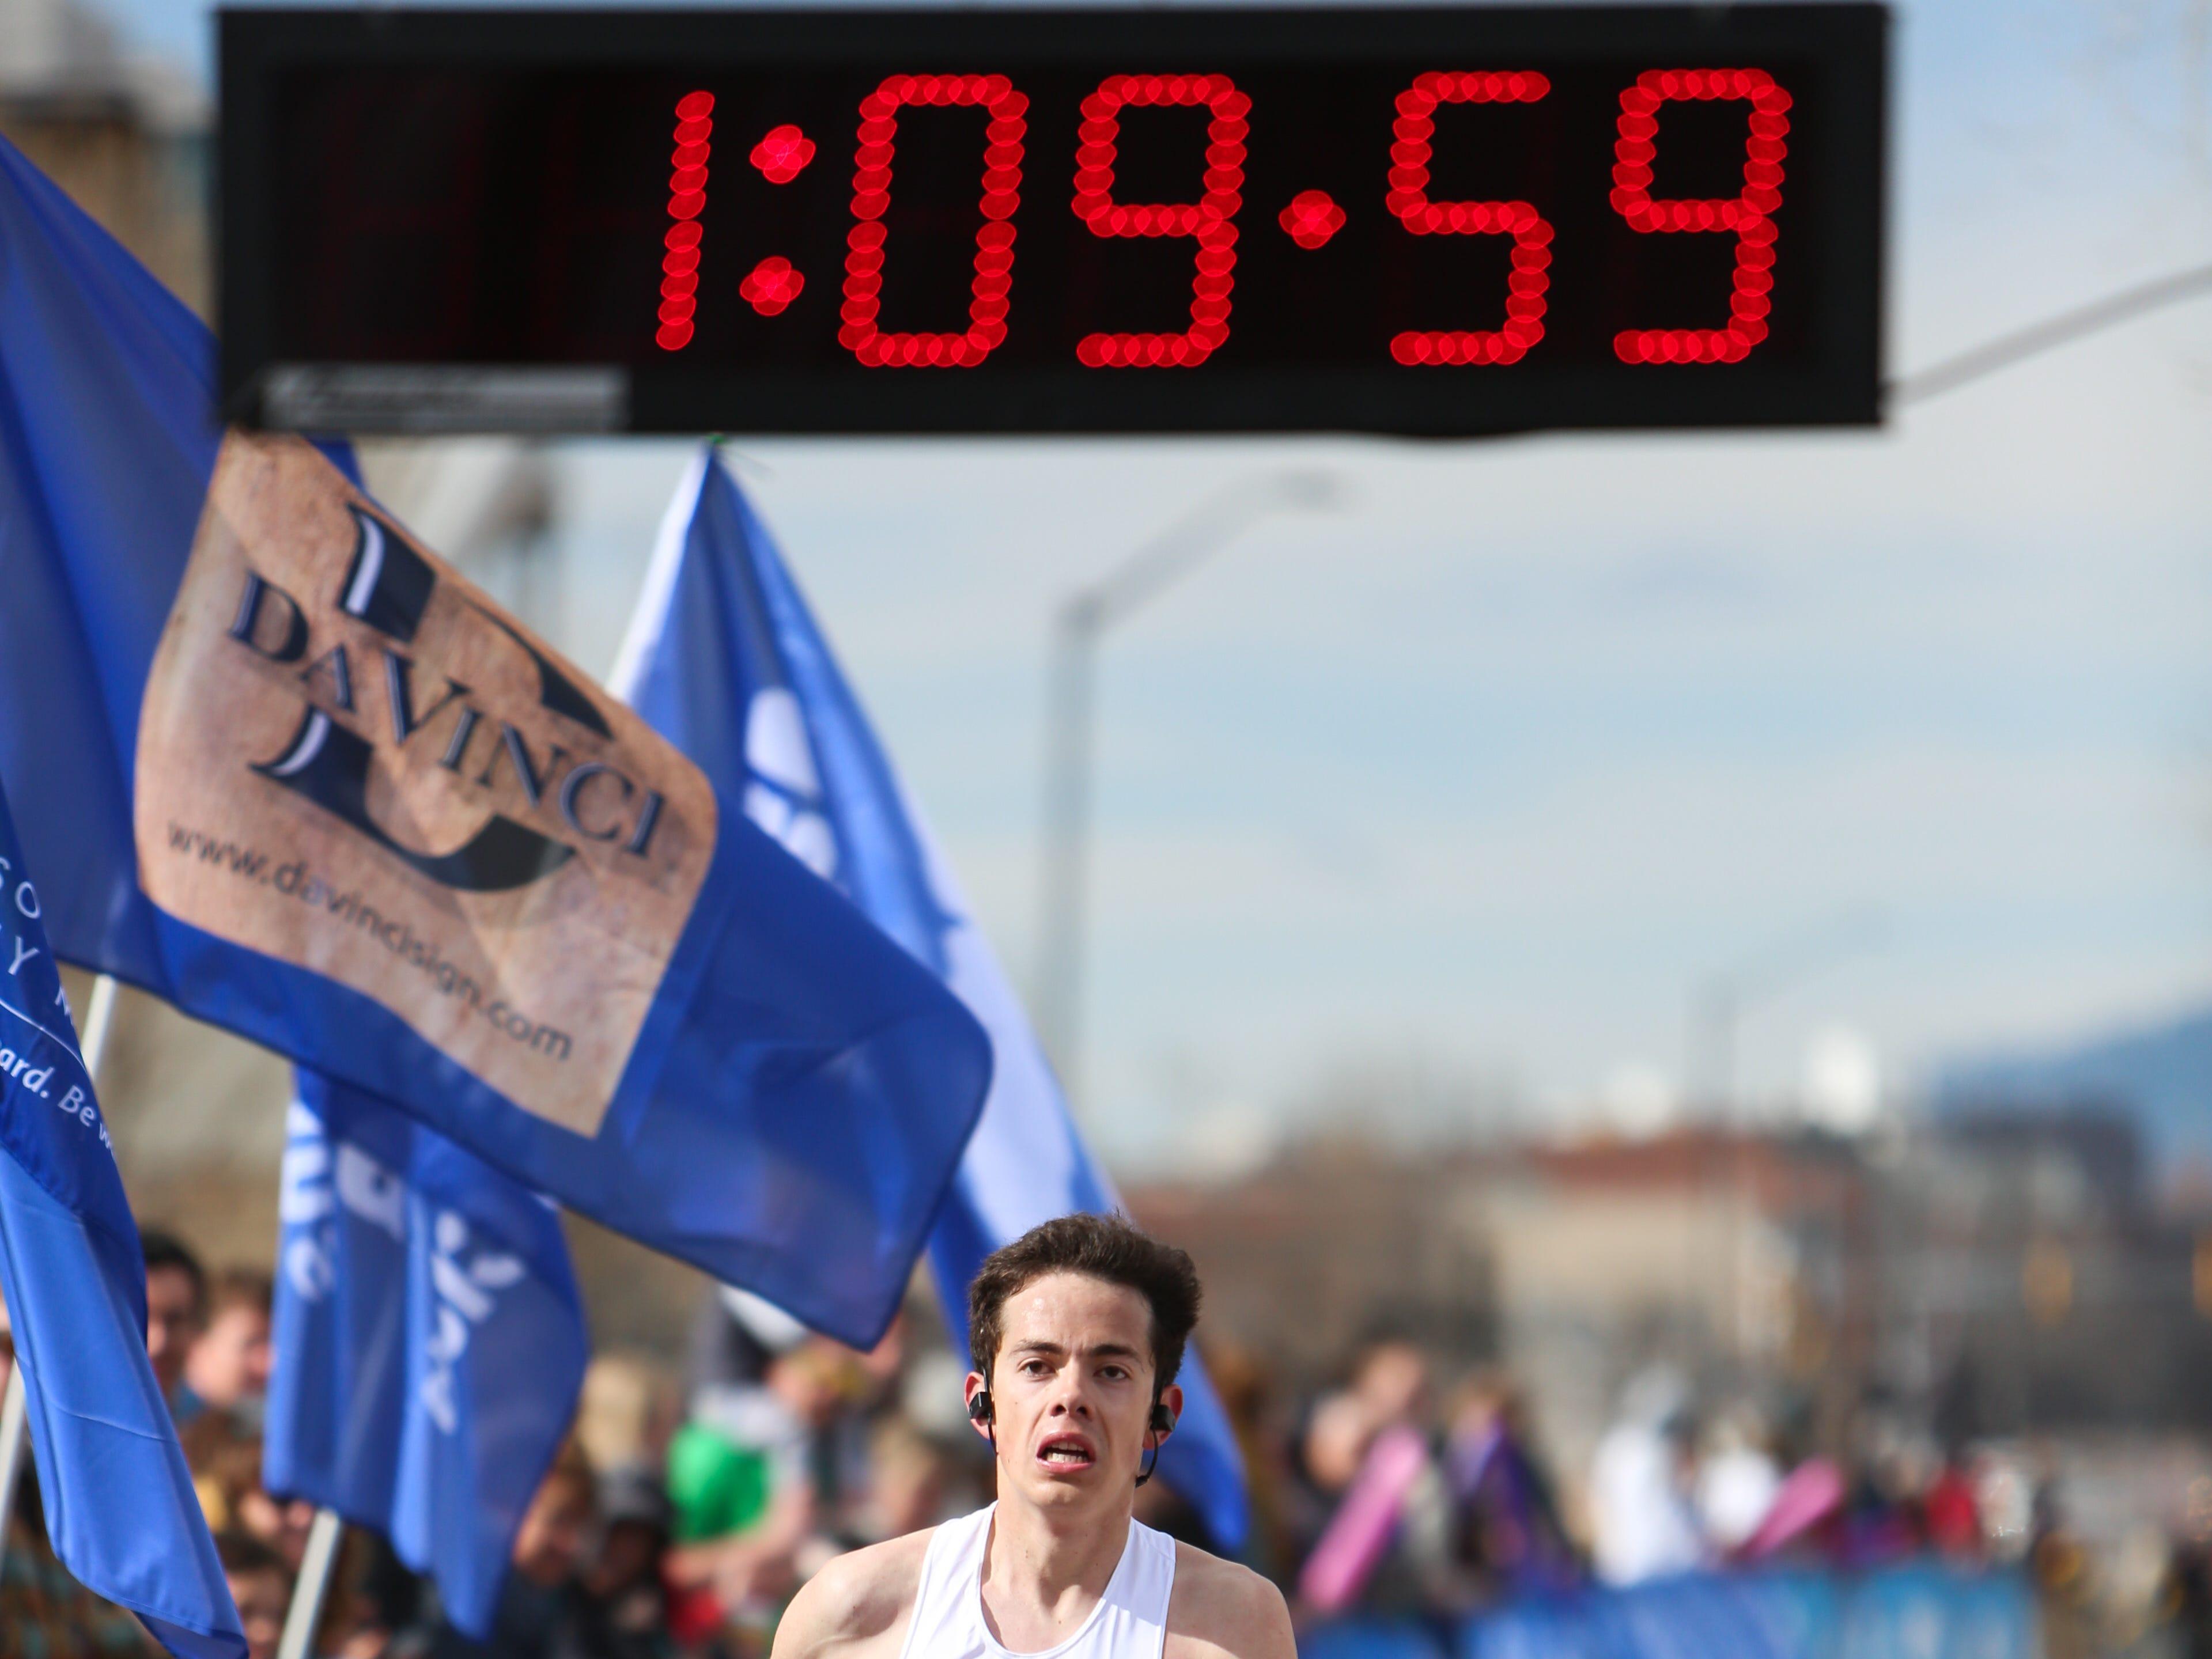 Alejandro Garcia completes the Horsetooth Half Marathon on April 14.